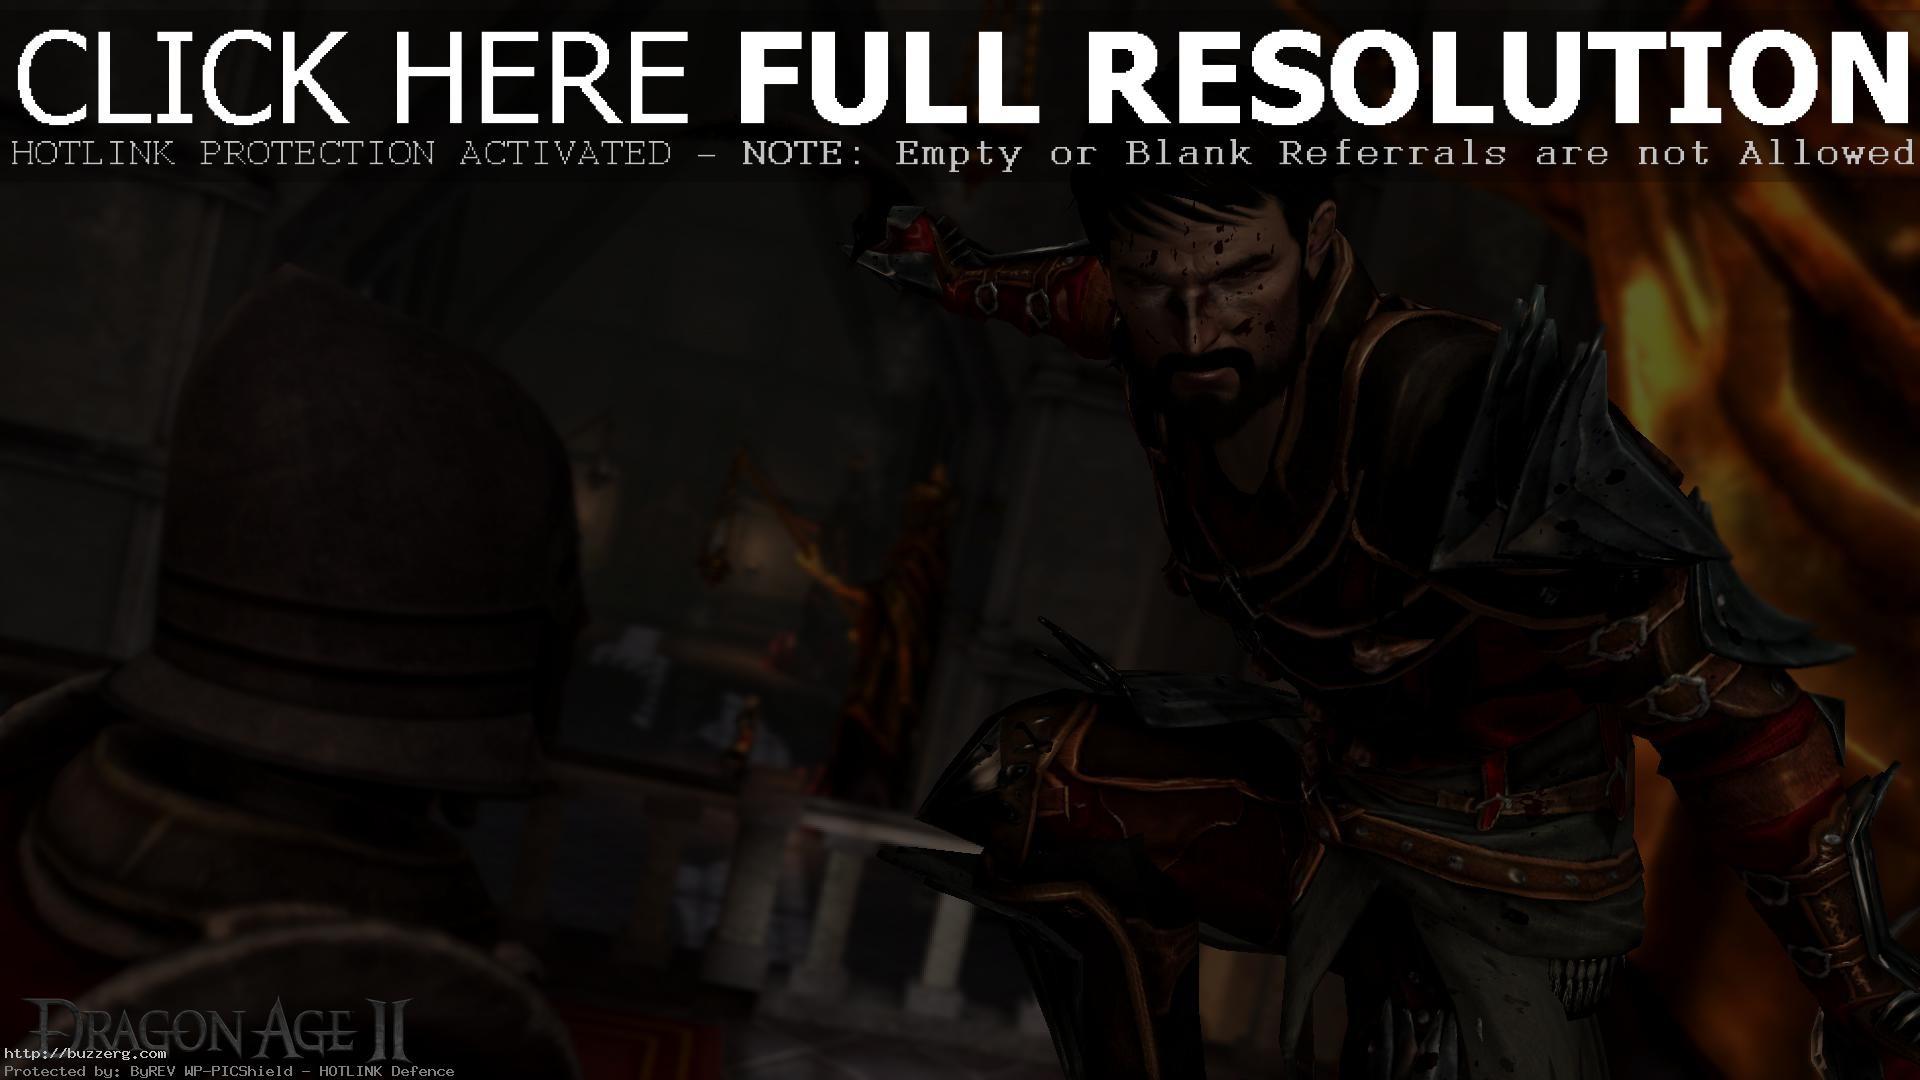 Dragon Age 2 Vamers (id: 160739)